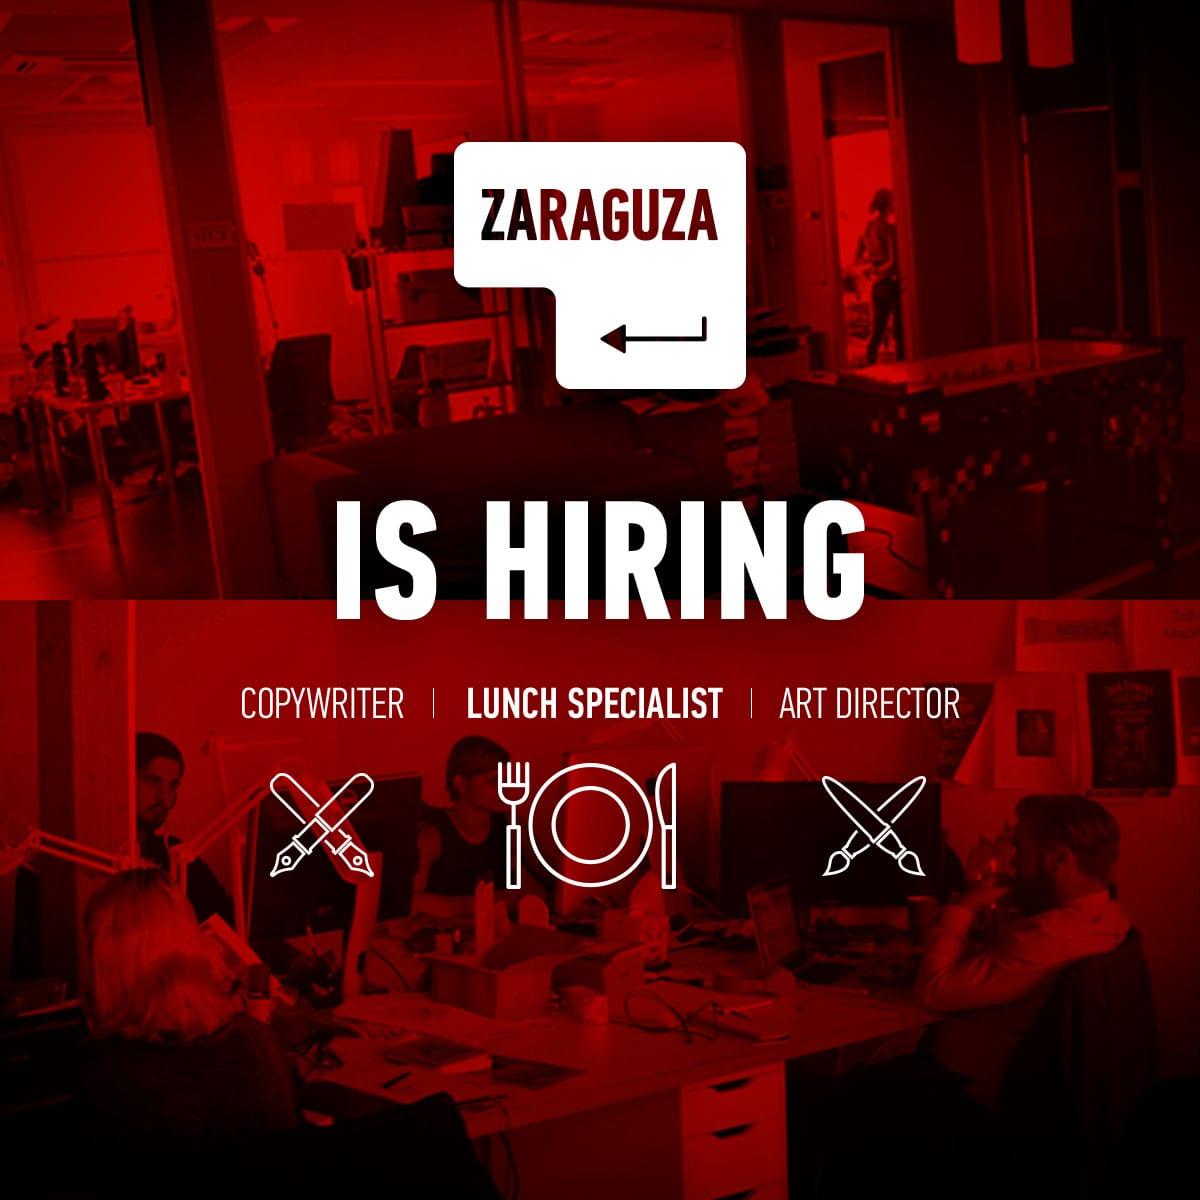 47d99558538f56f685a3c1dce9e6ef43 - ZARAGUZA obsadzuje nový kreatívny team: copywriter, art director, account, grafik, seeder